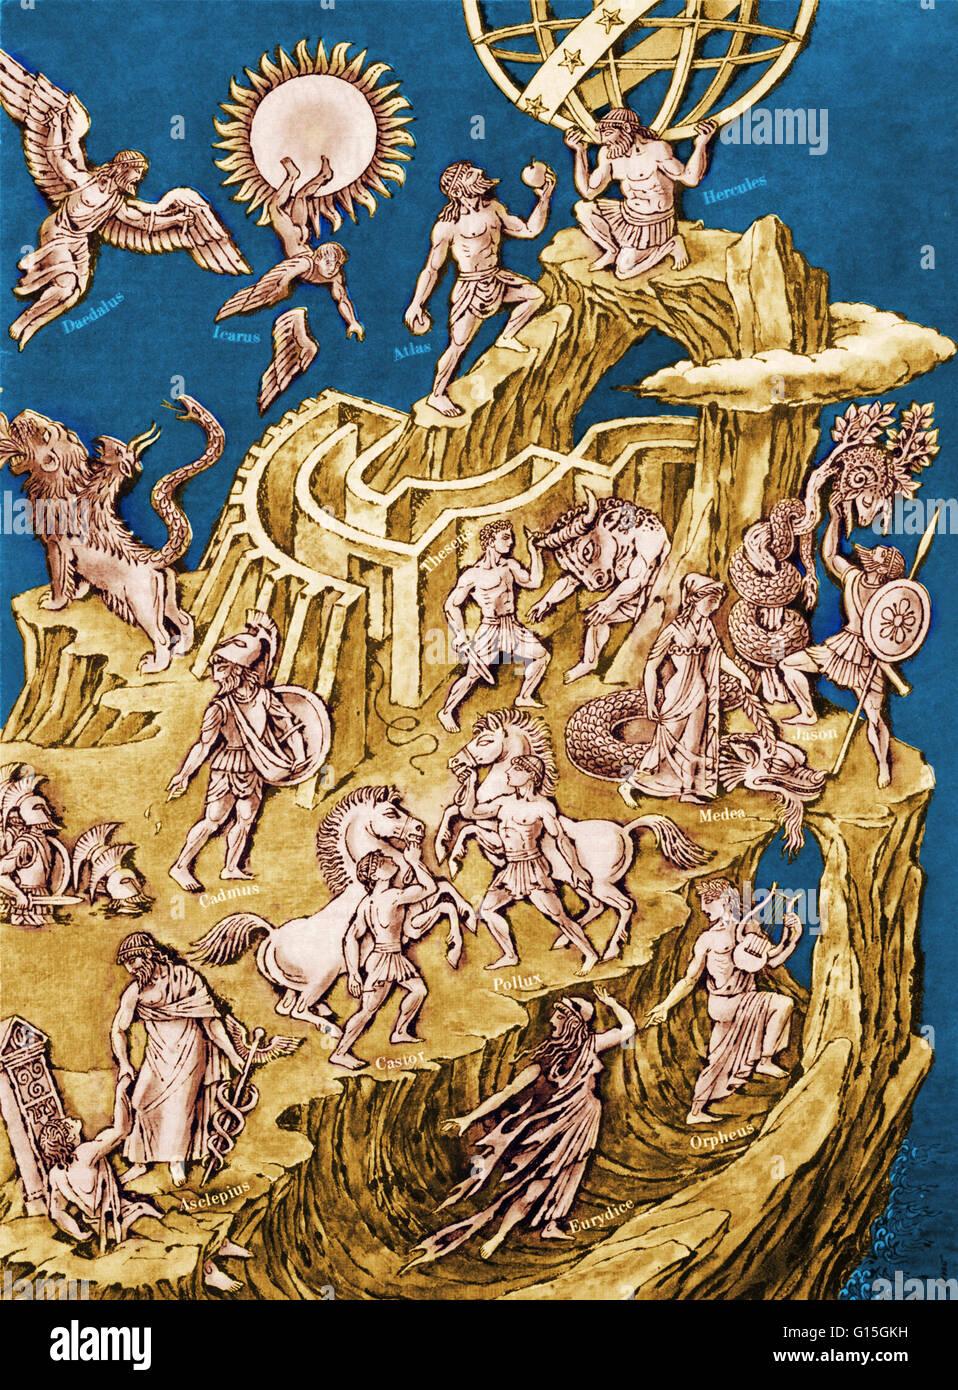 An illustration from Life Magazine (January 18, 1963) showing figures from Greek mythology, including Medea, Orpheus, - Stock Image